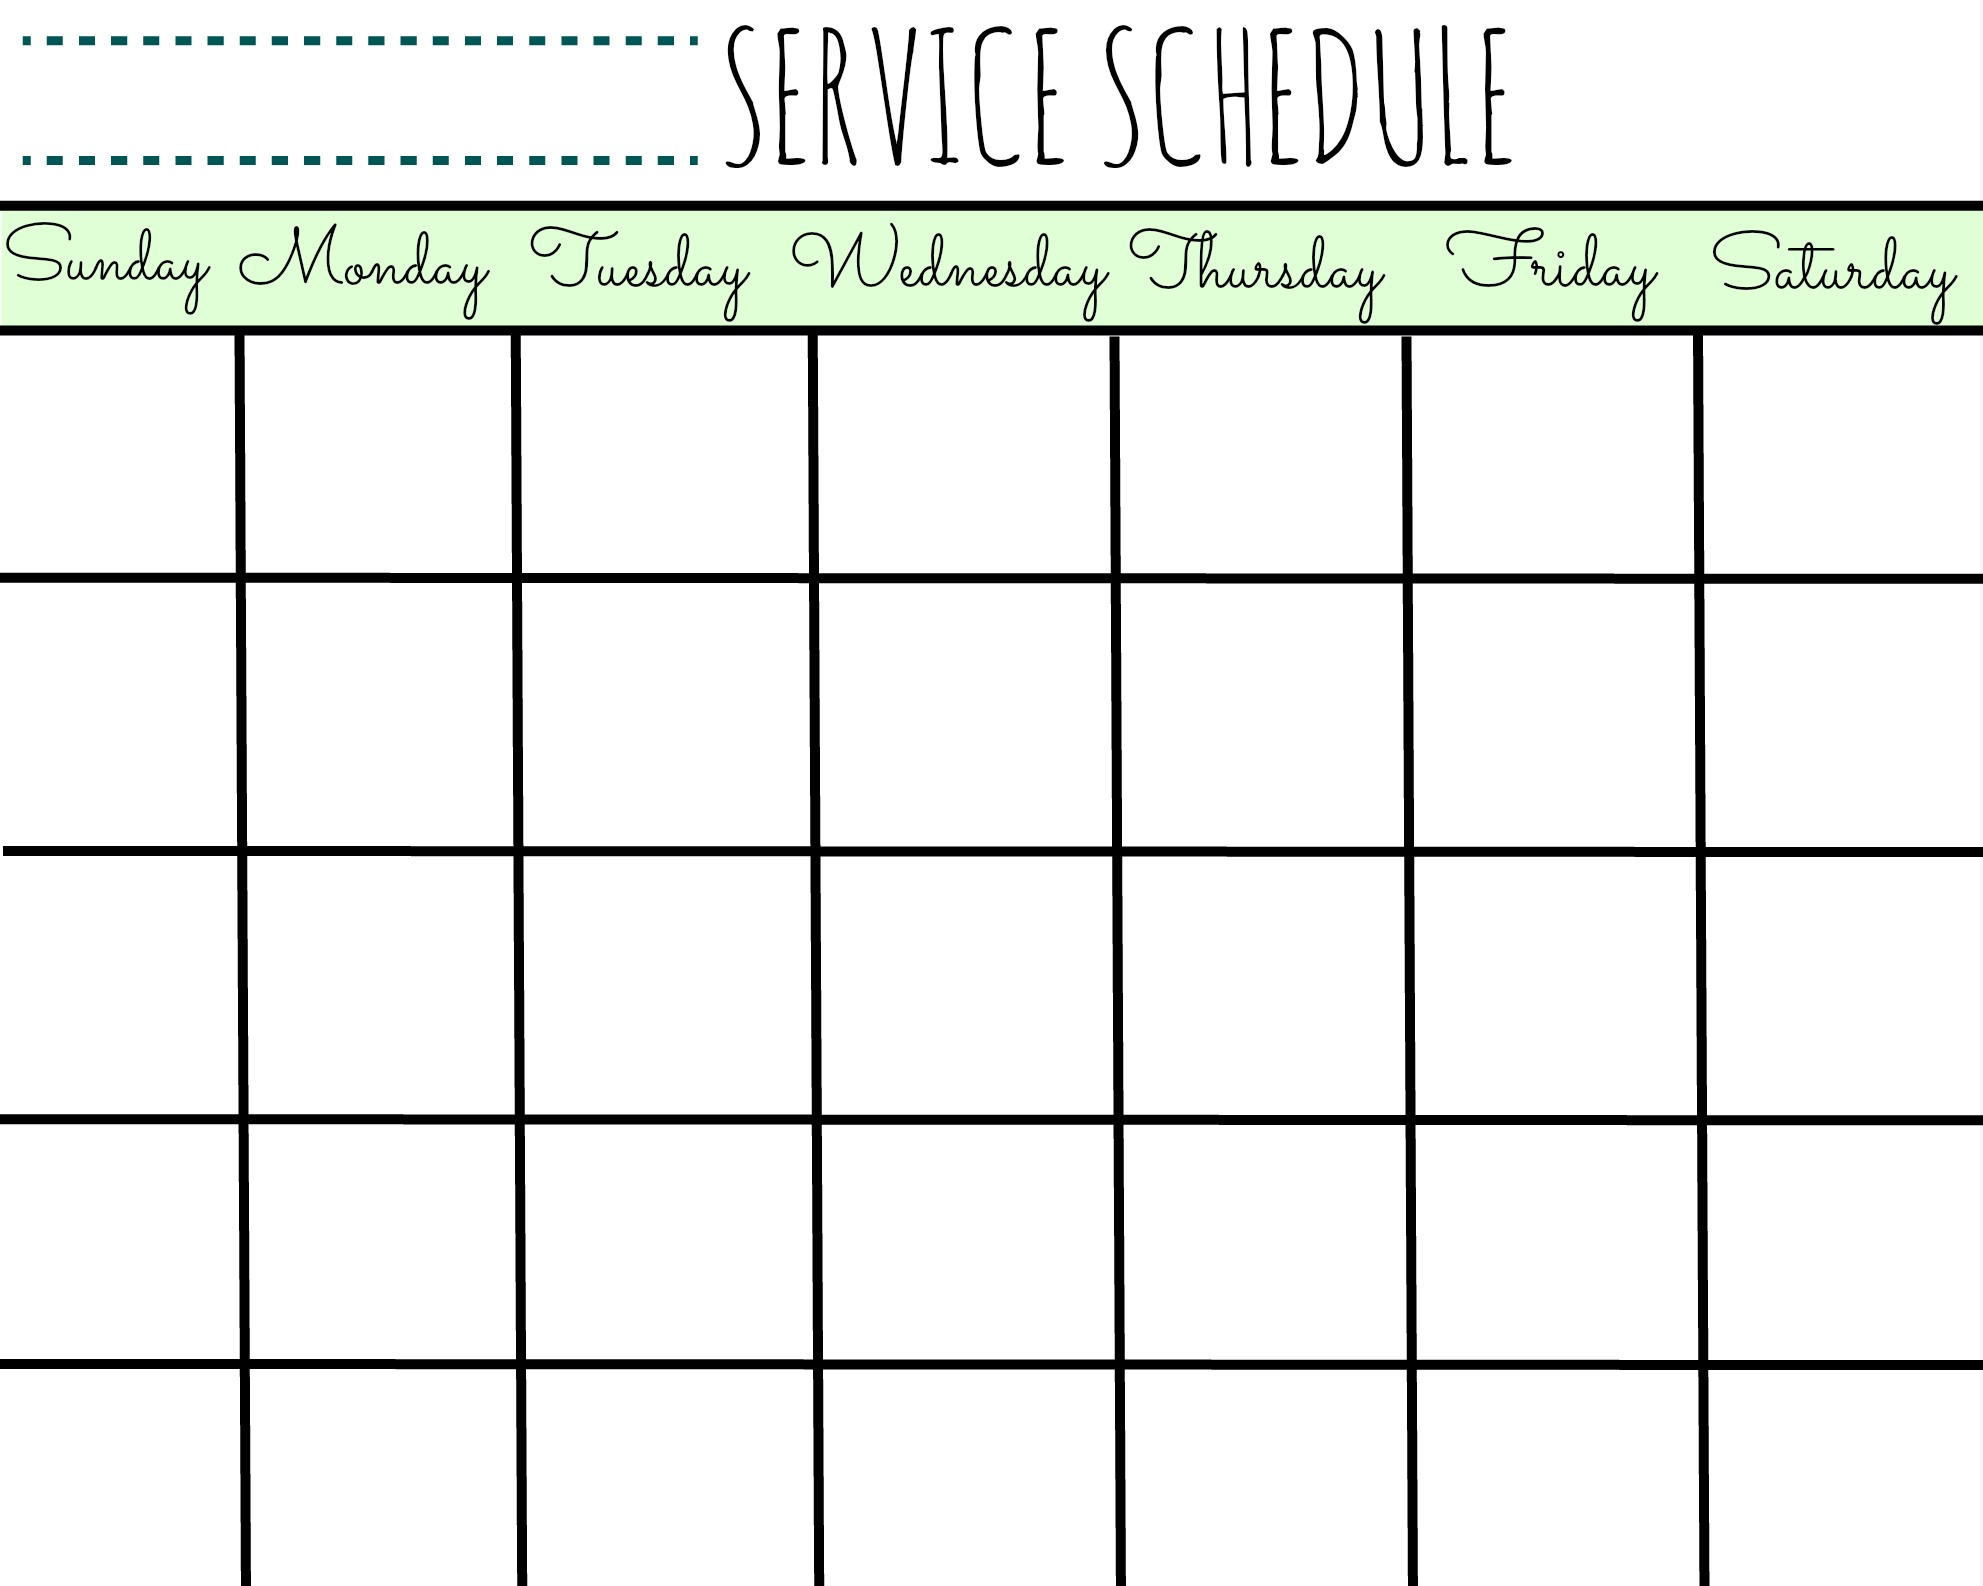 Best Printable Schedual